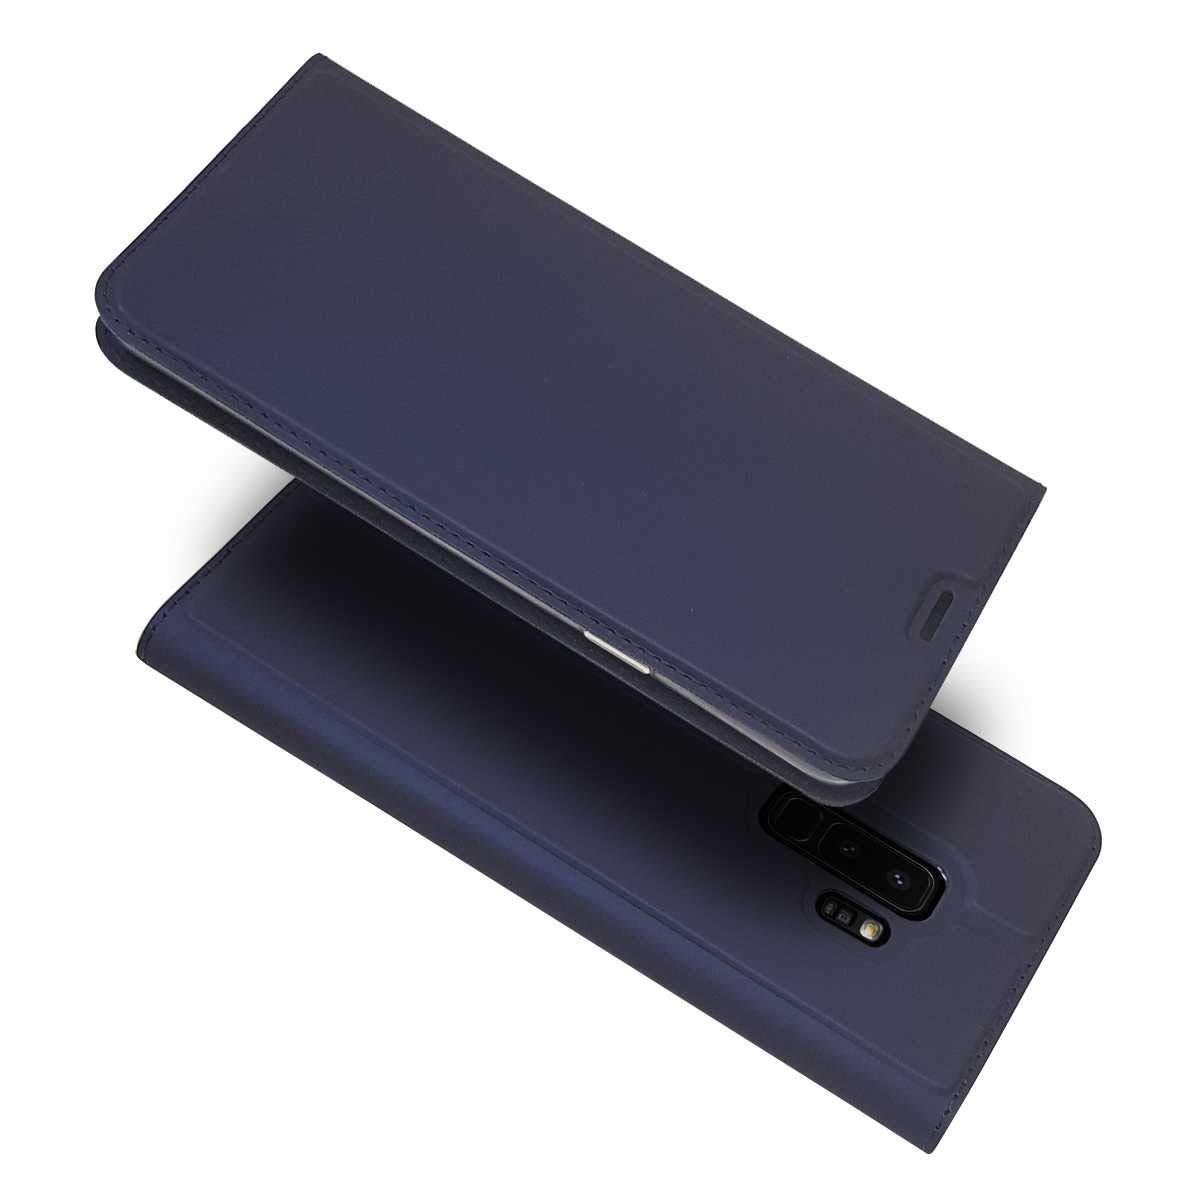 Galaxy S7 Hülle, Conber Lederhülle Handyhülle mit [Frei Schutzfolie], Premium Ultra Dünn PU Tasche Leder Flip Case Cover Schutzhülle für Samsung Galaxy S7 - Blau Galaxy S7 Hülle